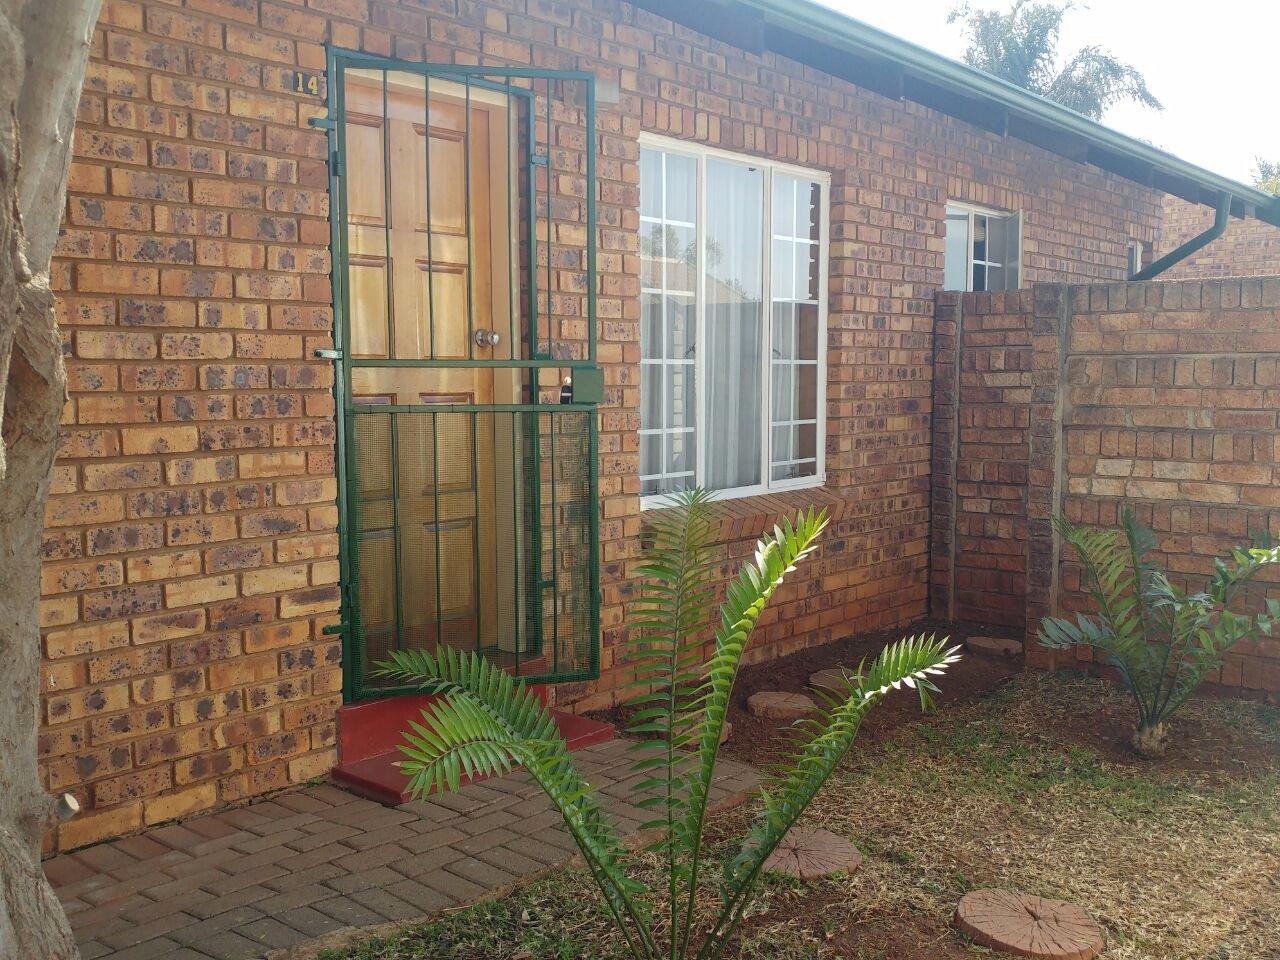 Pretoria, Moreletapark Property  | Houses For Sale Moreletapark, Moreletapark, Townhouse 2 bedrooms property for sale Price:929,000